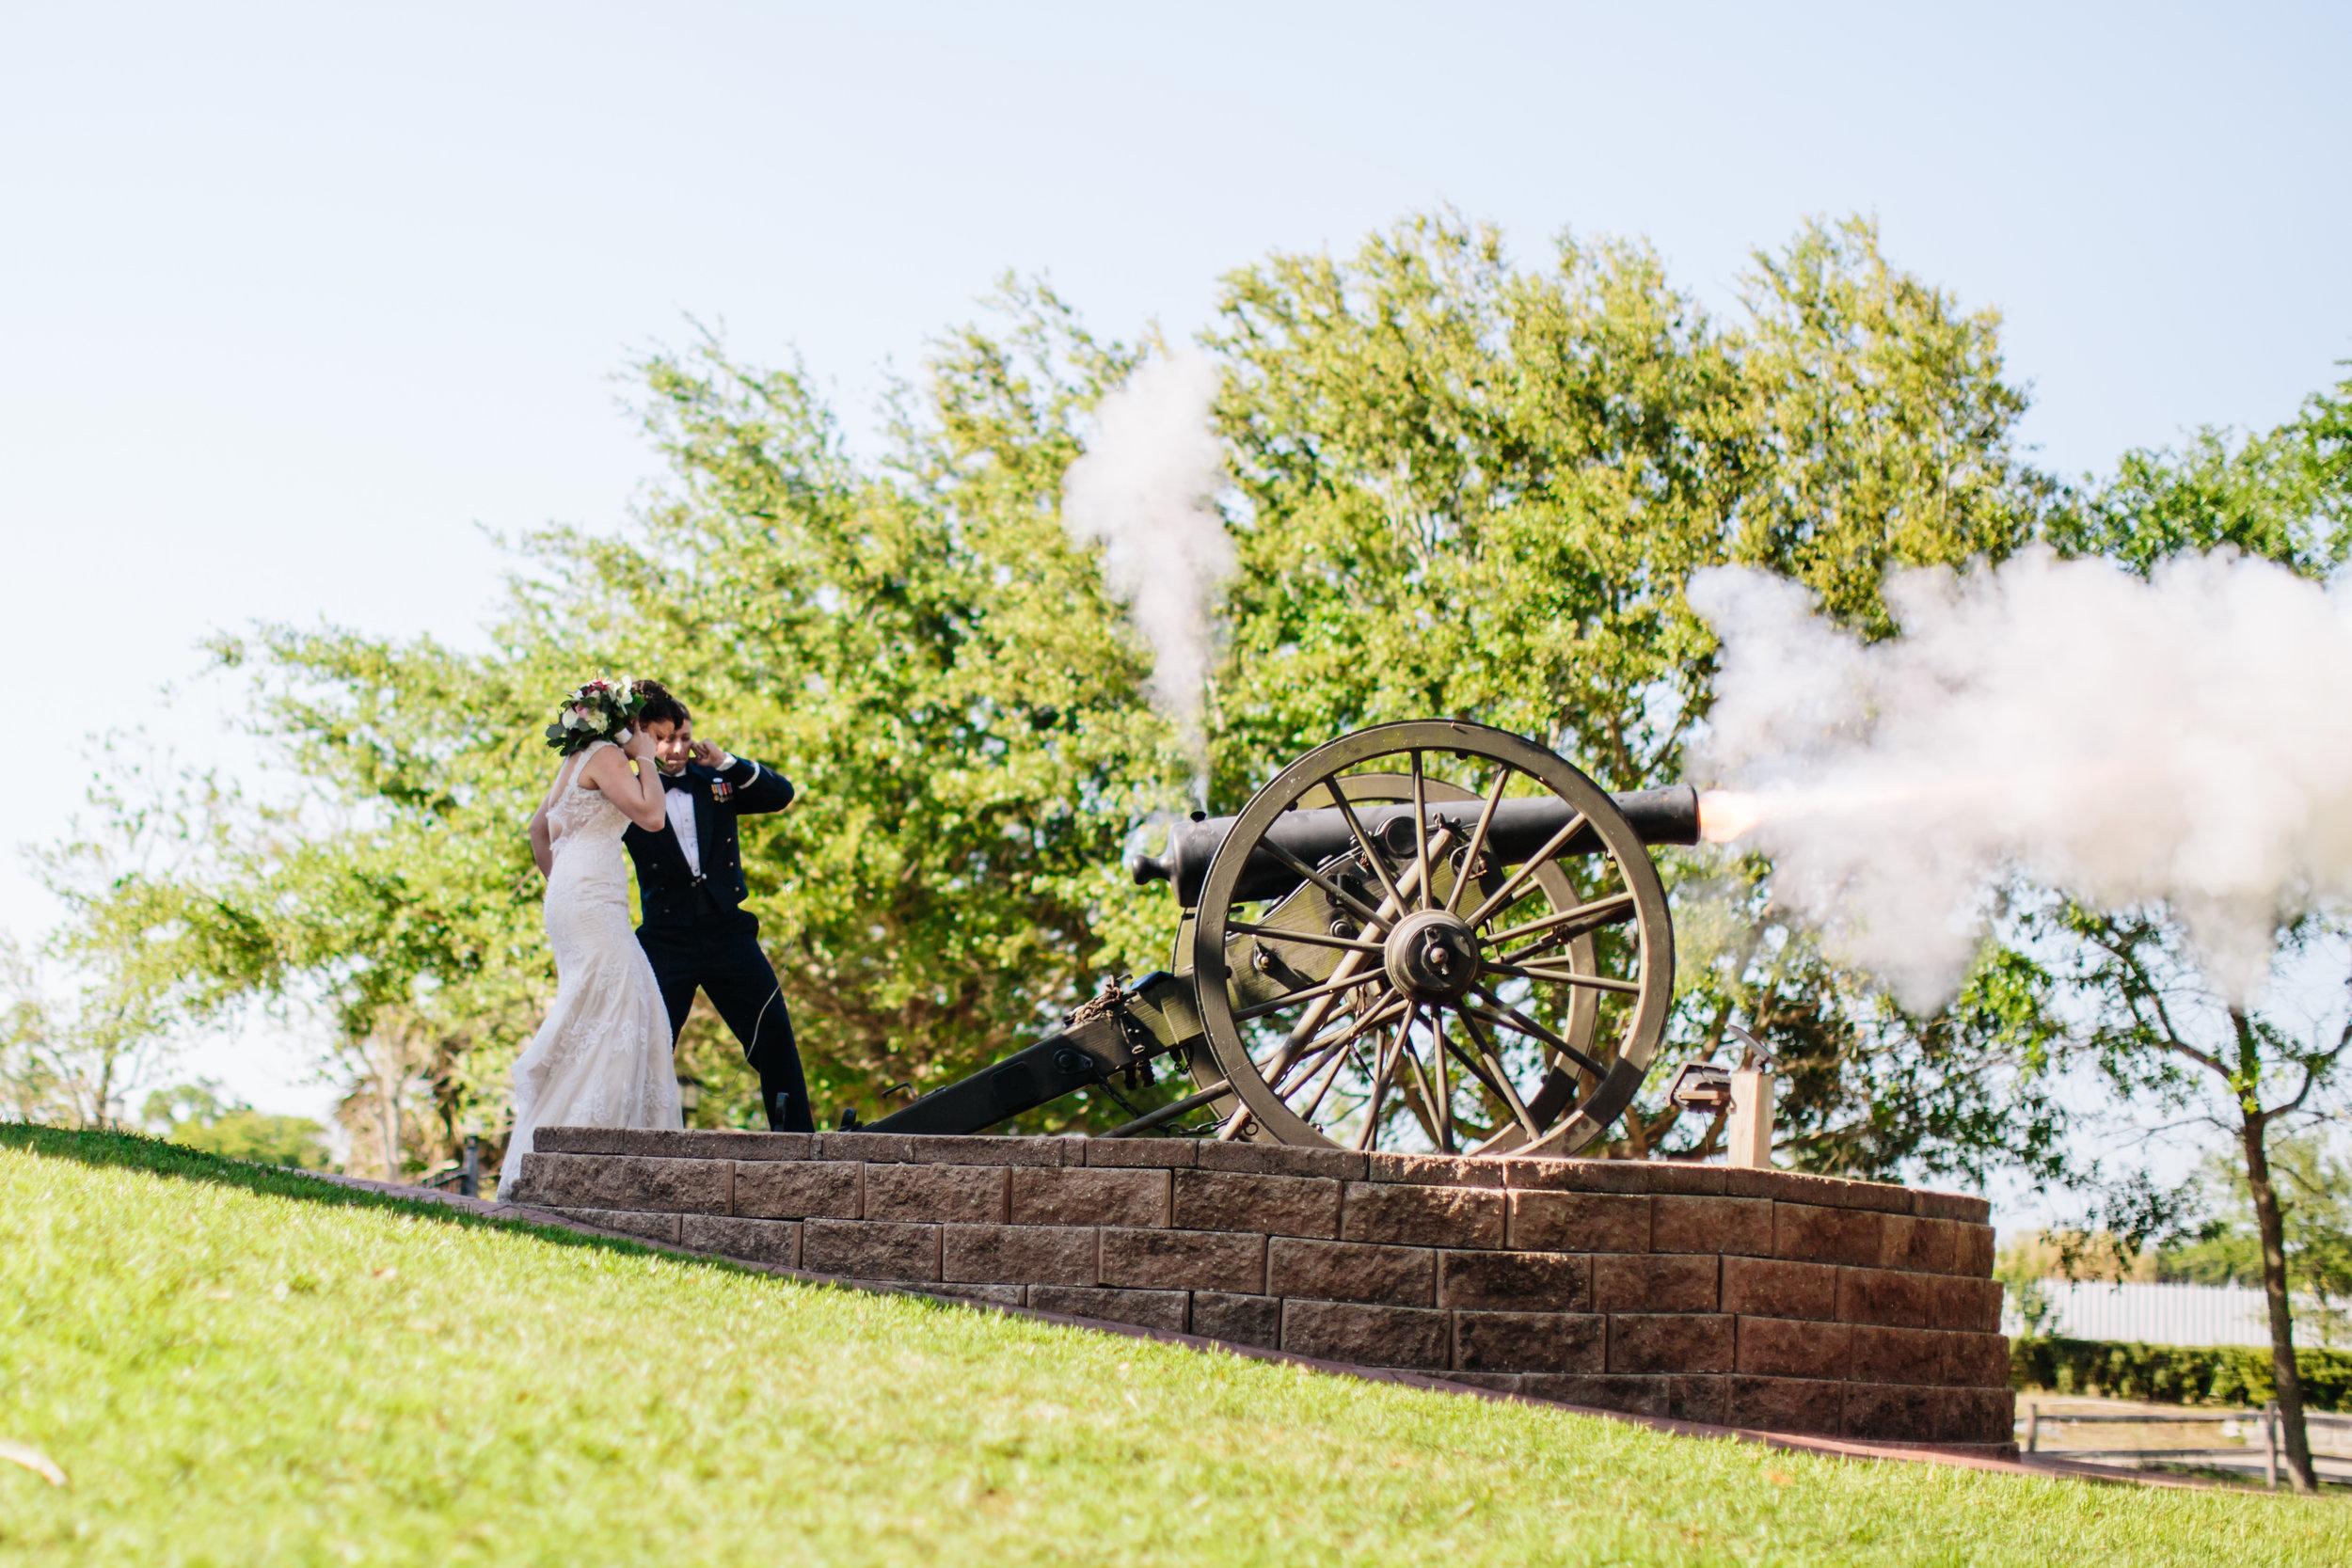 2018.03.17 Allison and Chuck Wedding Waelti Melbourne (542 of 569).jpg